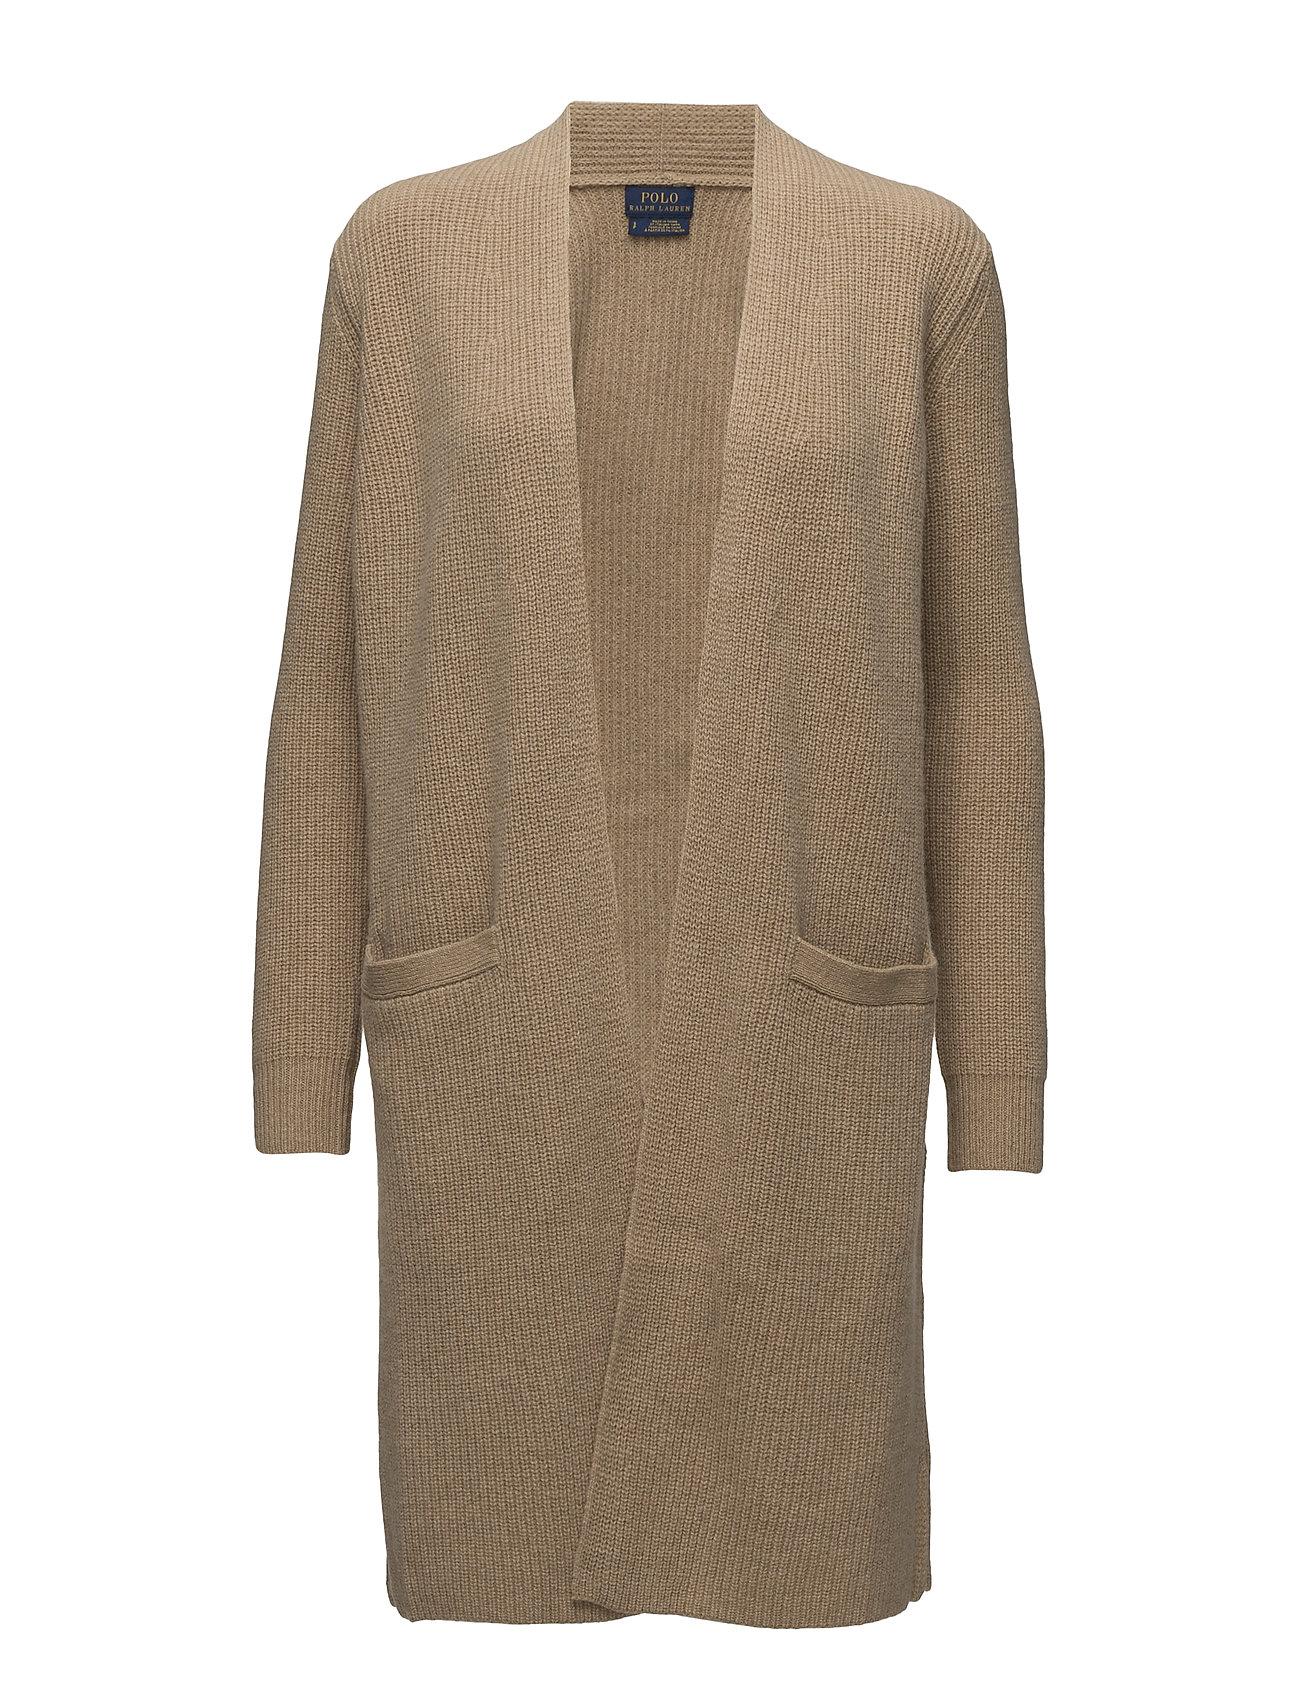 Wool-cashmere Cardigan (Camel Melange) (£175) - Polo Ralph Lauren ...